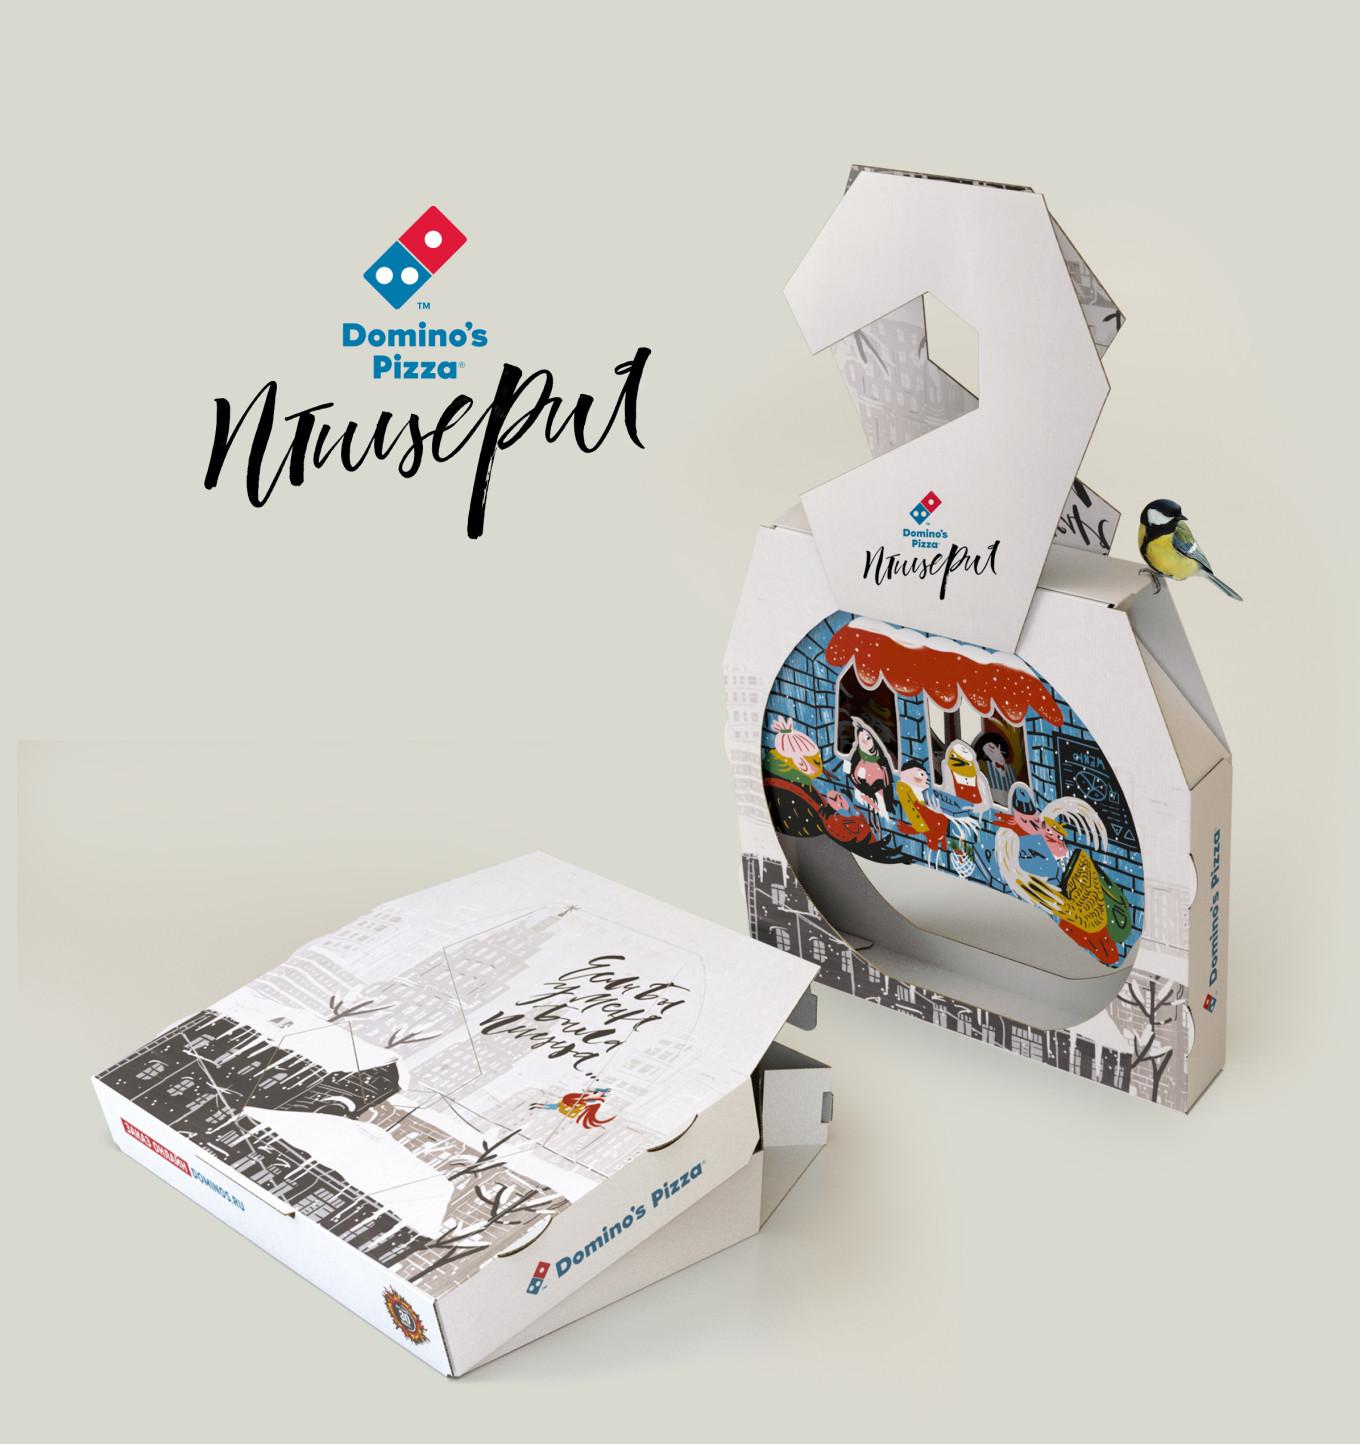 Domino's Pizza доставляет в Москве пиццу в коробках-кормушках для птиц